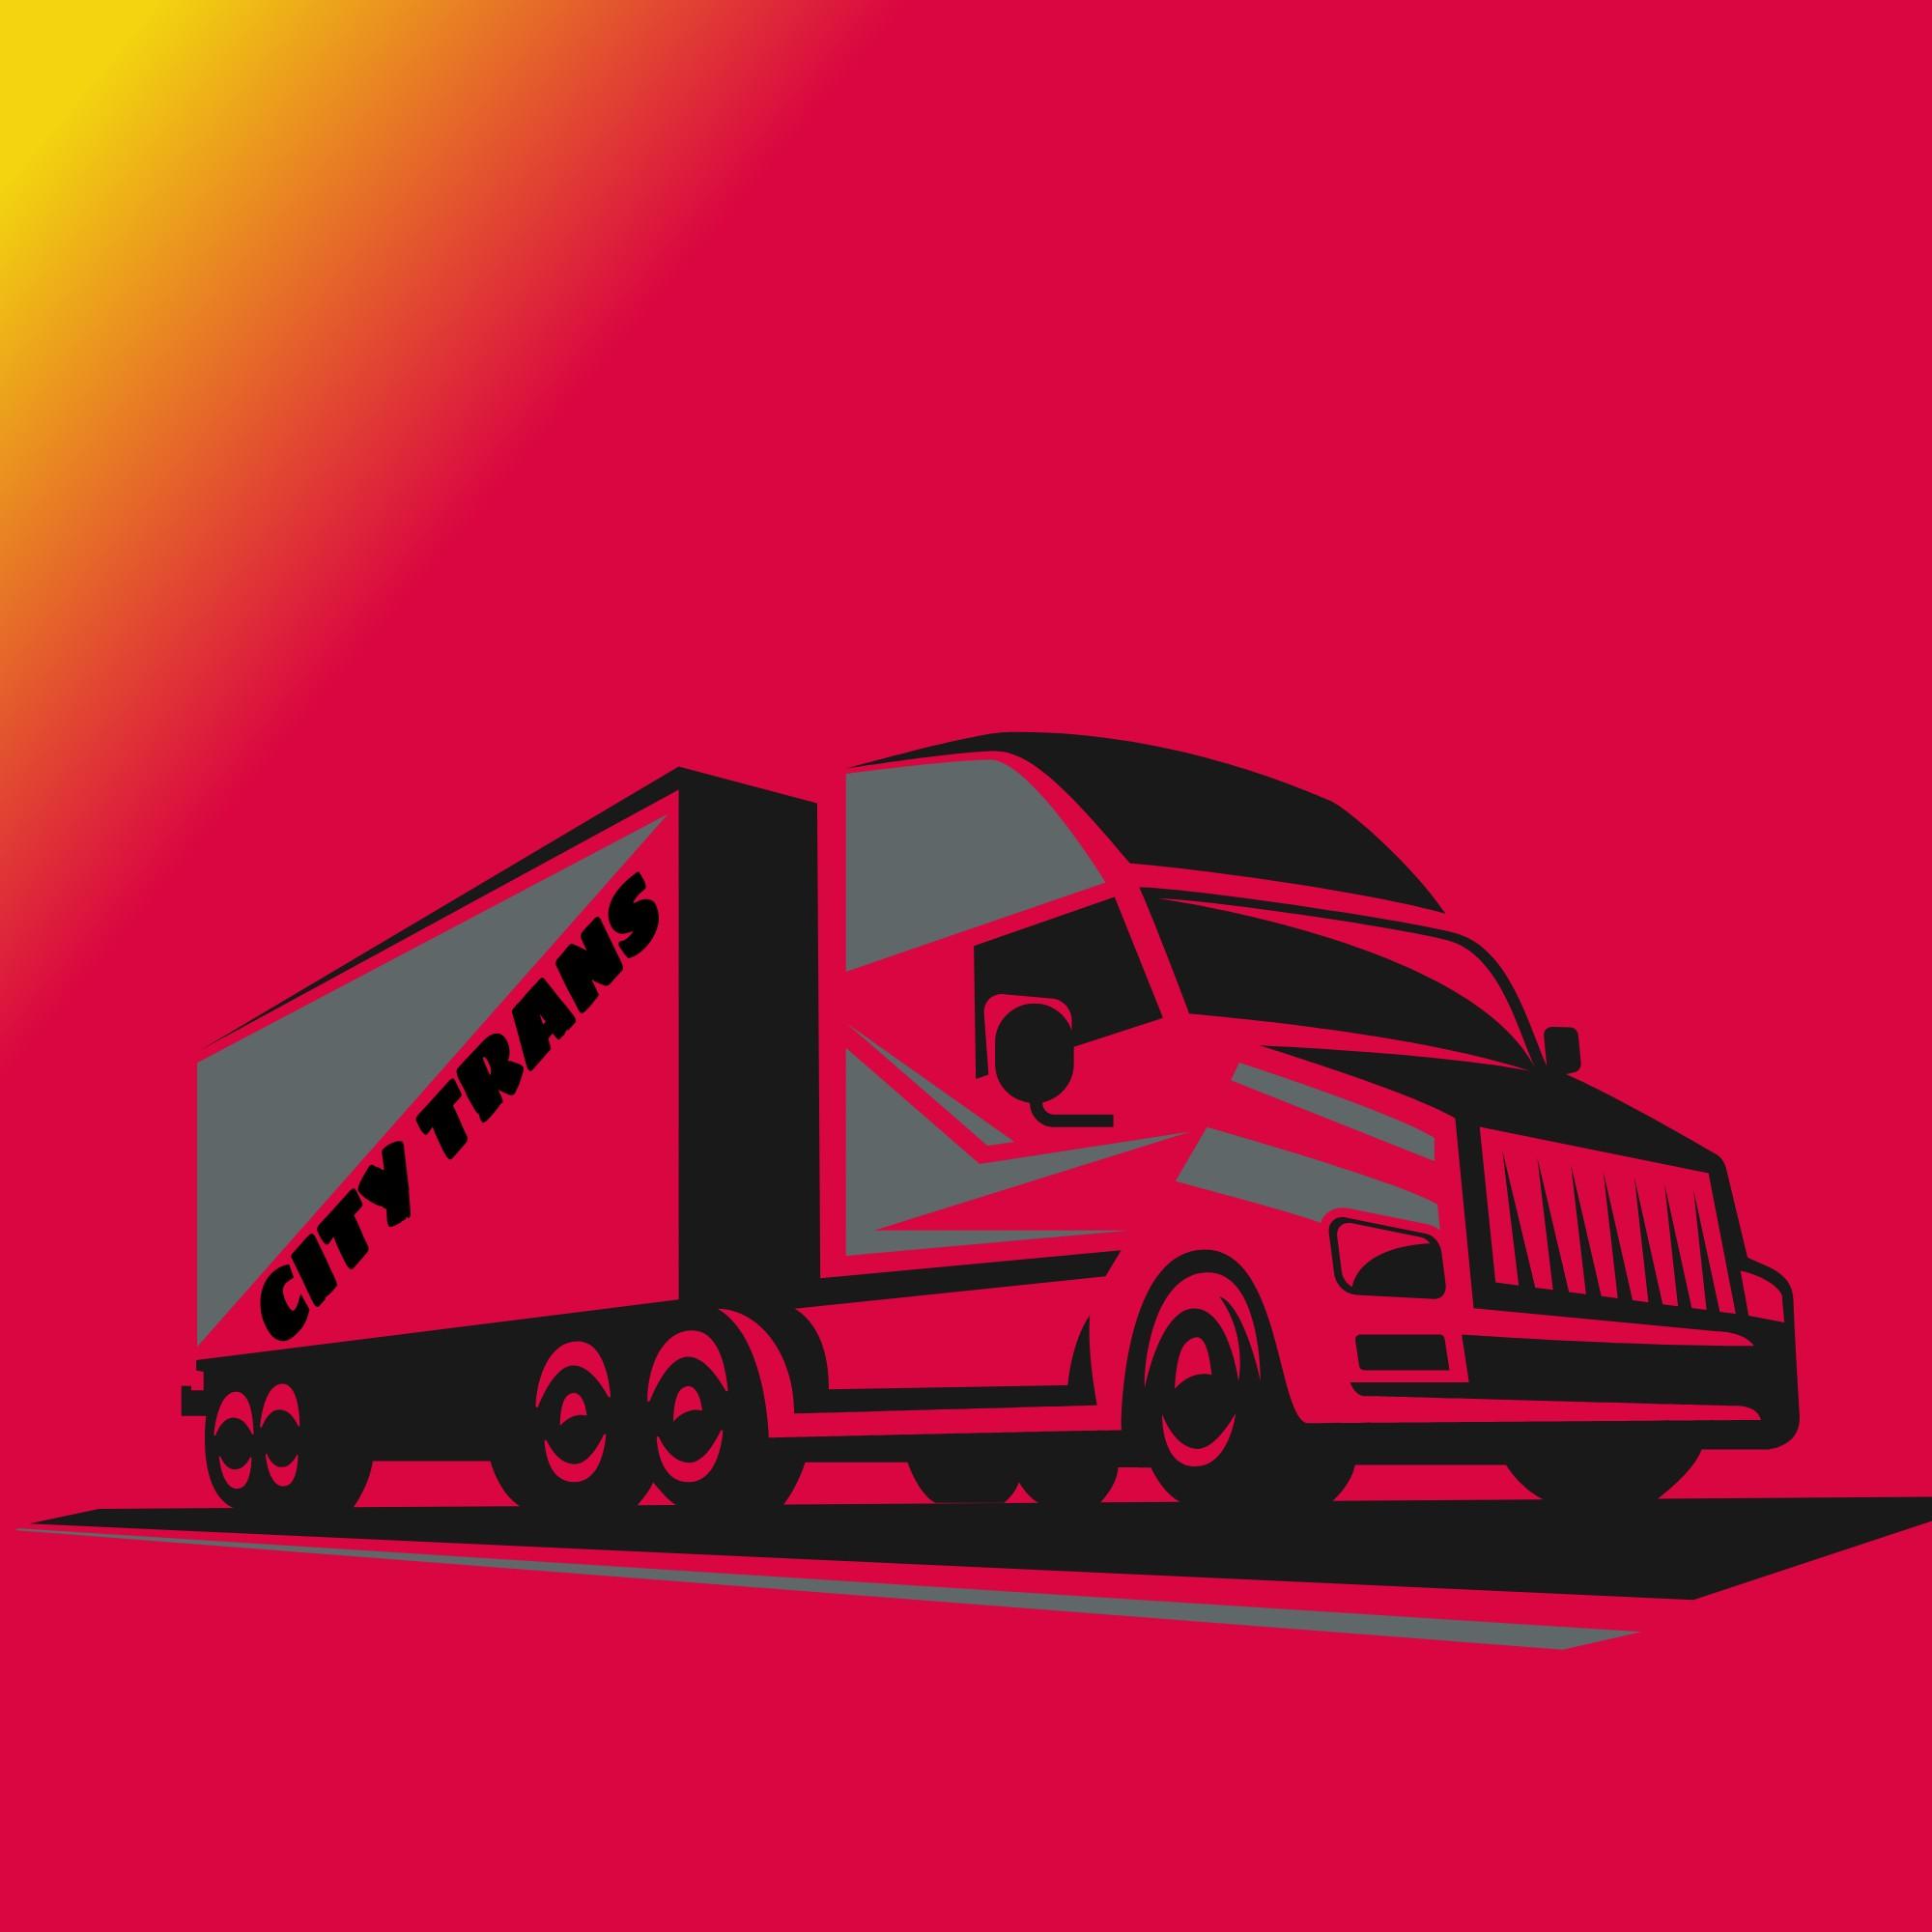 Разработка Логотипа транспортной компании фото f_4045e6ceaea5eba9.jpg